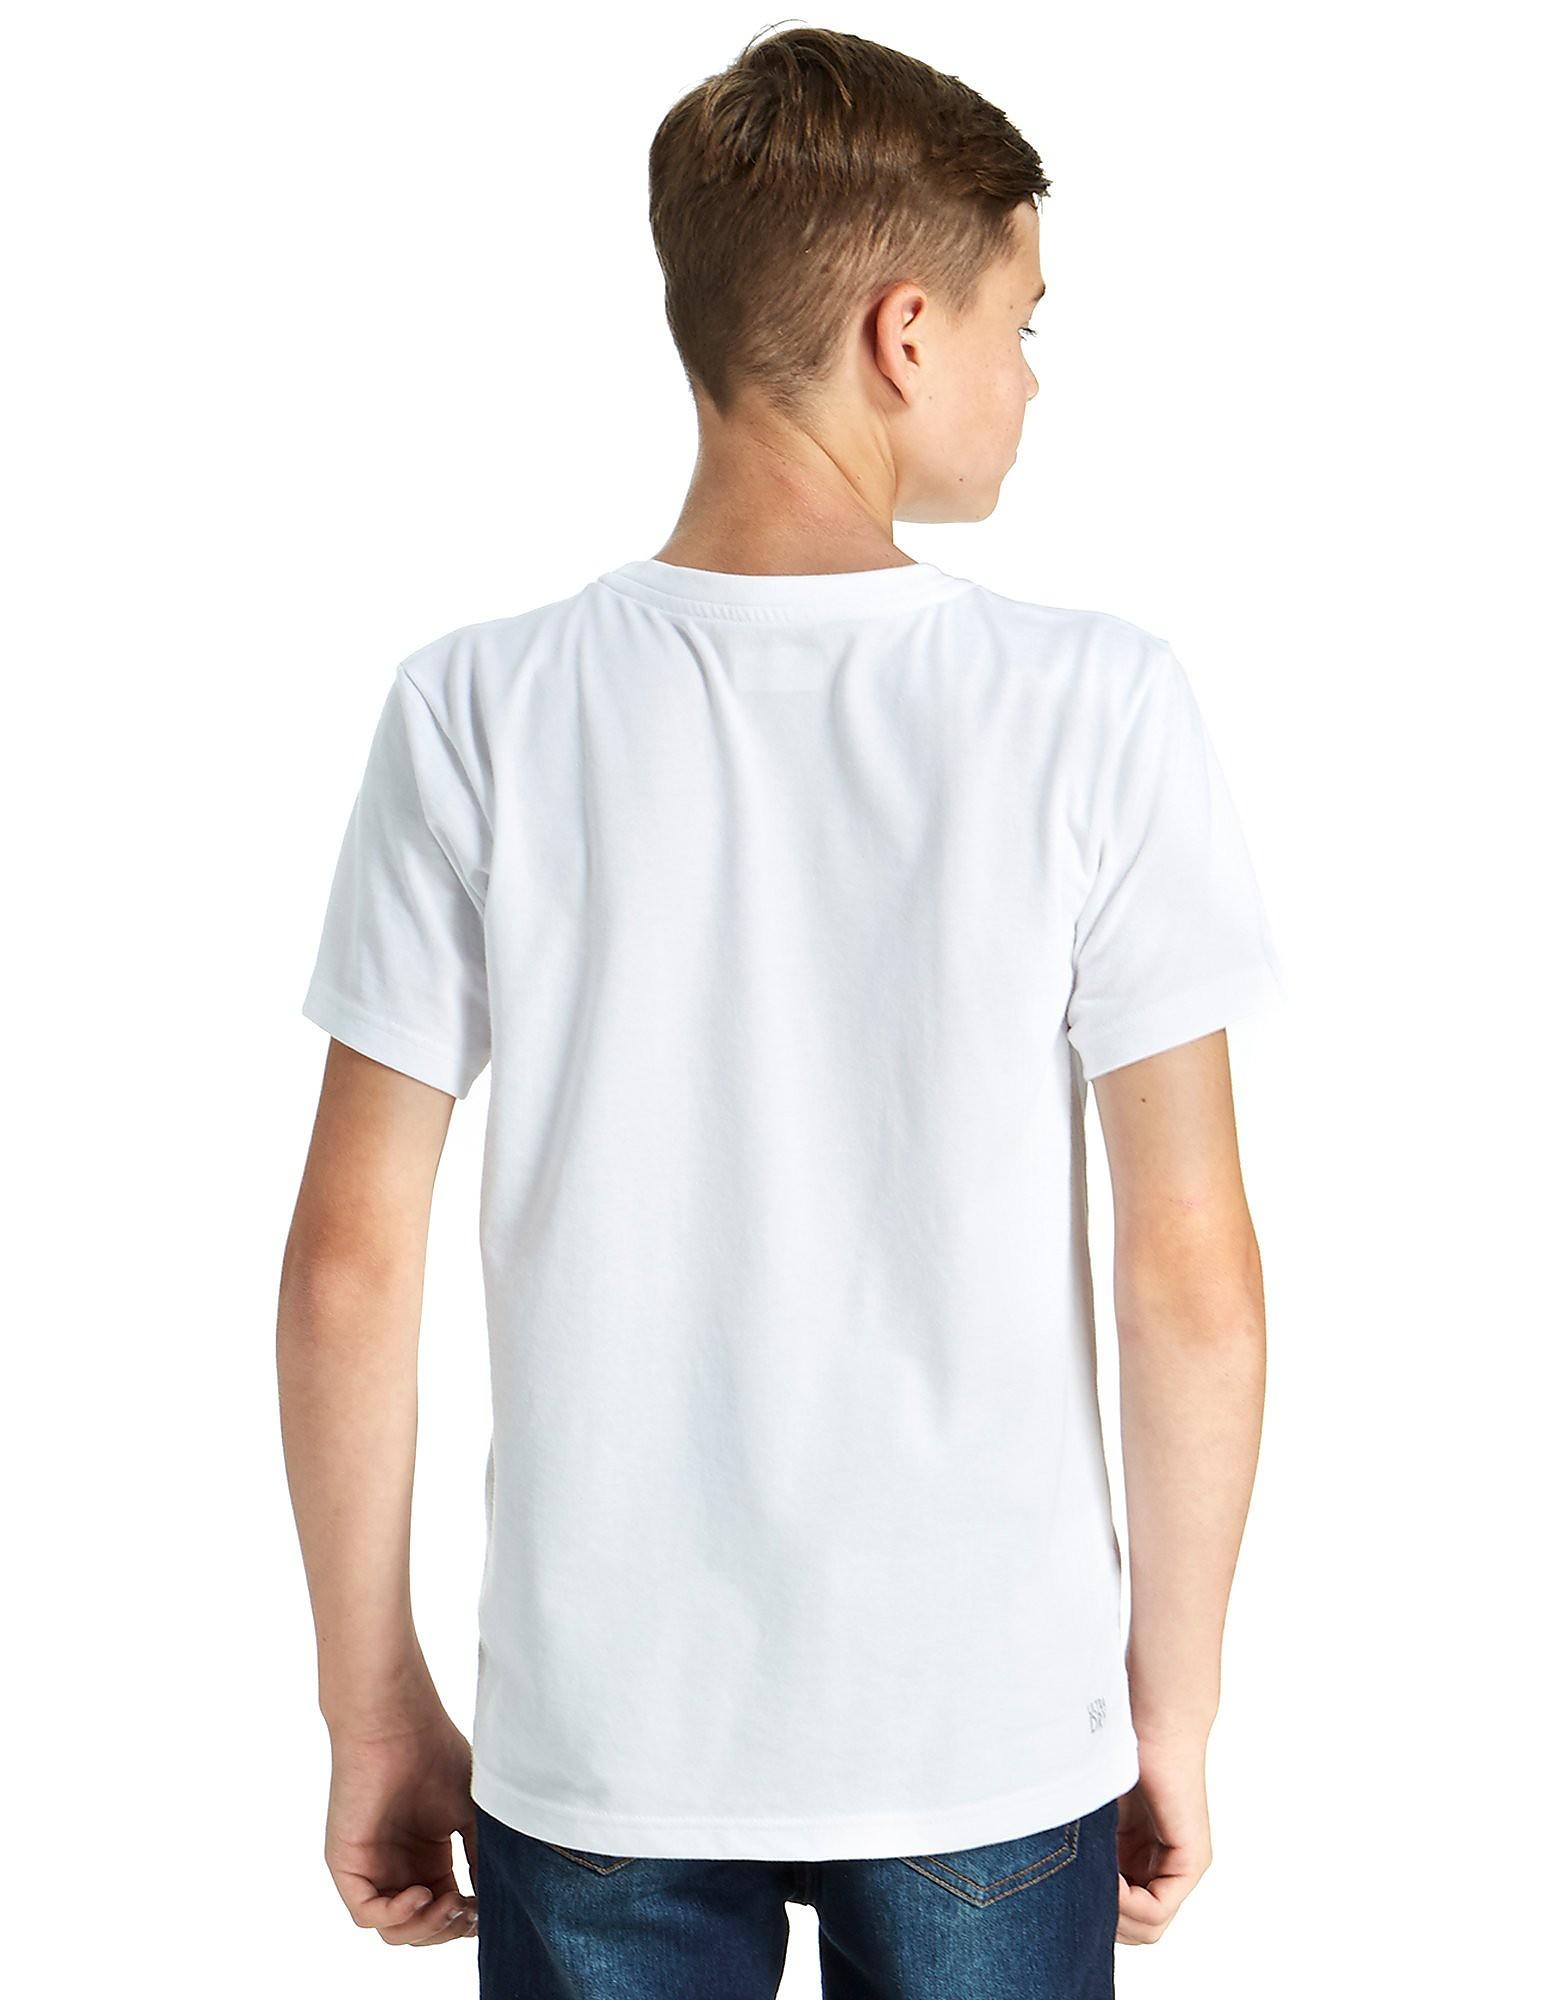 Lacoste Tennis Graphic Print T-Shirt Junior